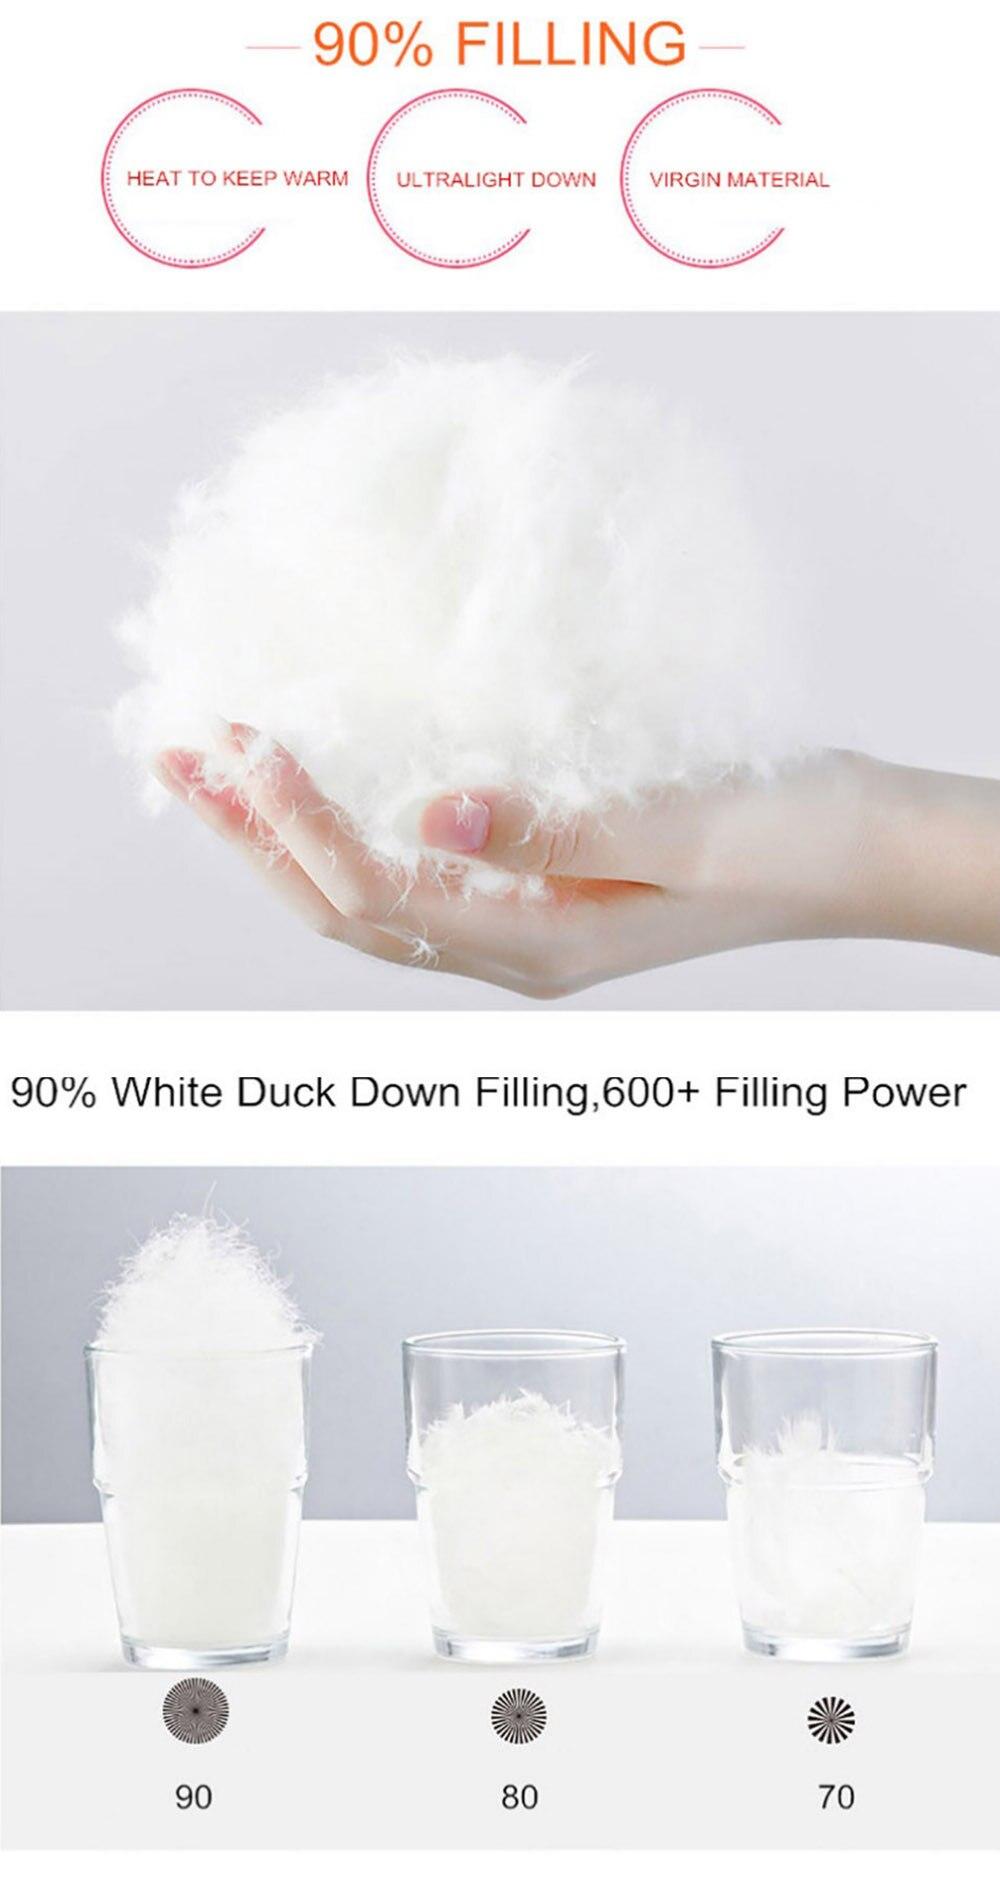 HTB1Y3UKDCBYBeNjy0Feq6znmFXai Plus Size 5XL 6XL 7XL Winter Down Jacket Women Eiderdown Outwear Winter Warm Coat Ultralight White Duck Down Coat Female Parka